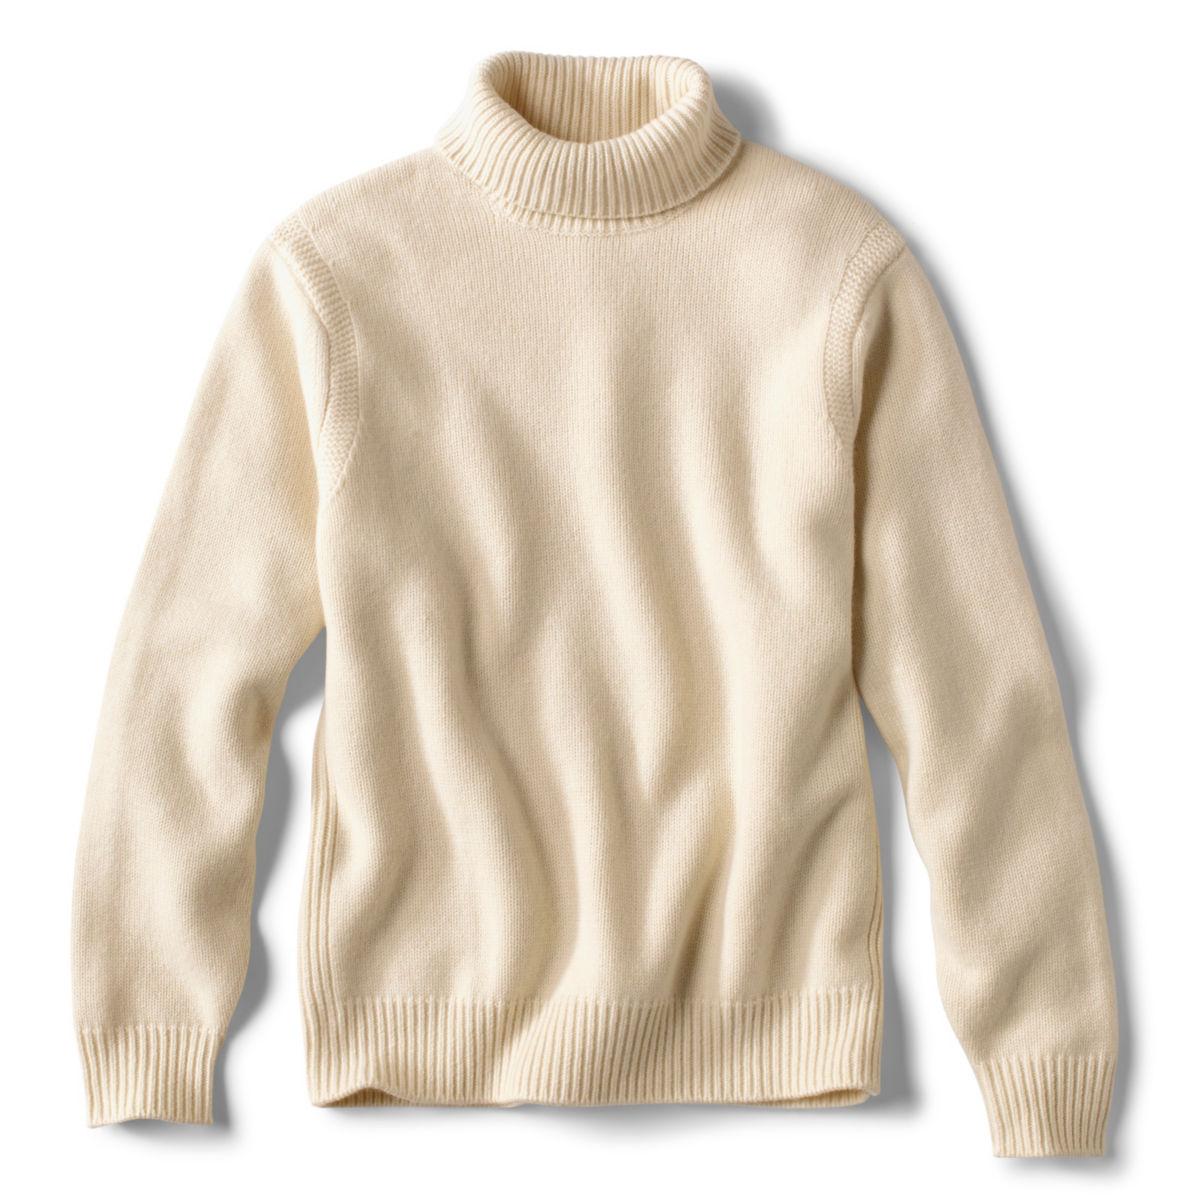 Royal Air Force Aircrew Sweater - NATURALimage number 0